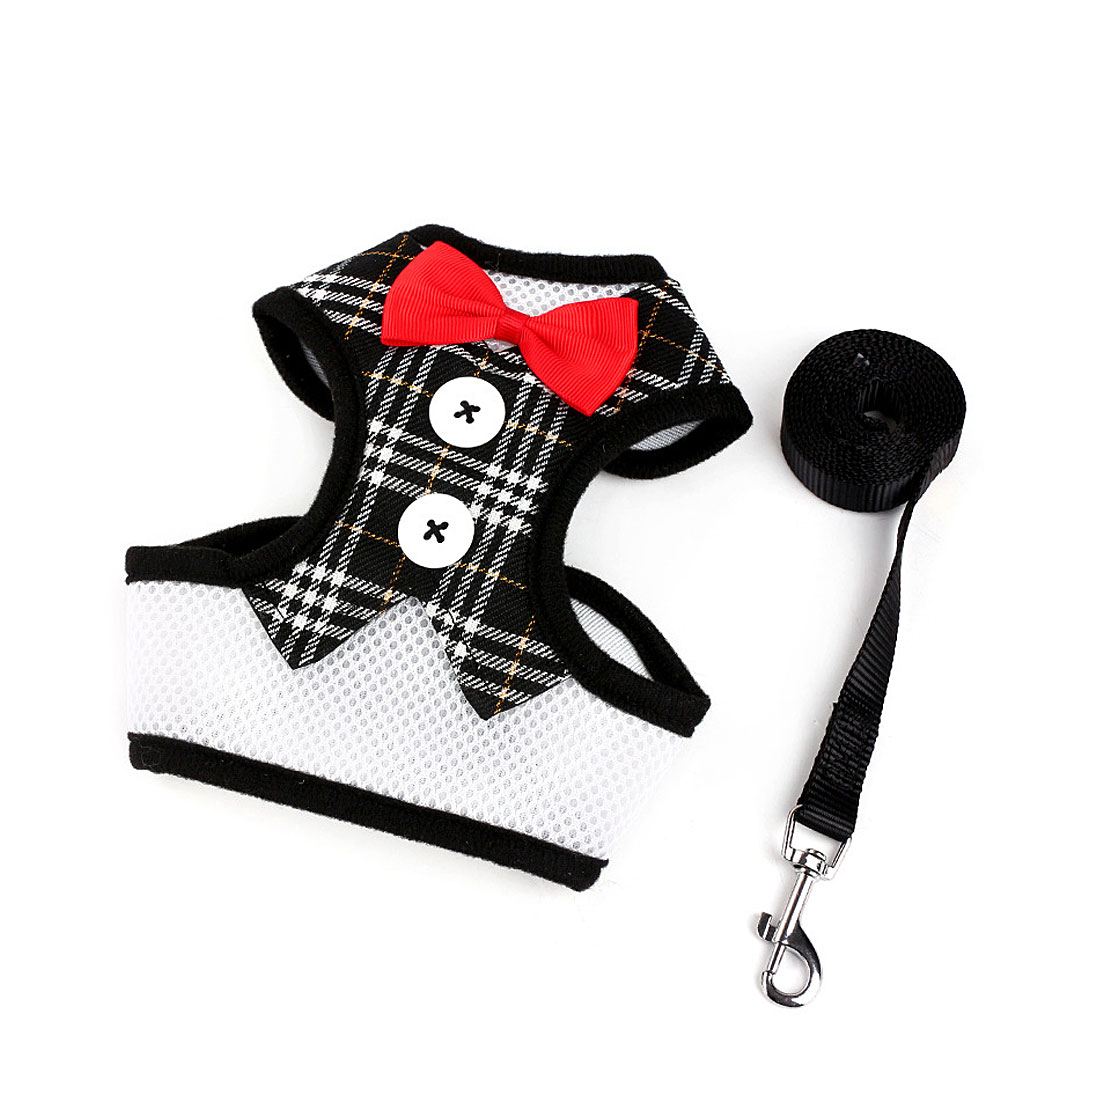 Adjustable Padded Small Dog Harness Breathable Dog Vest Bowtie Gentleman Suit Black Grid L